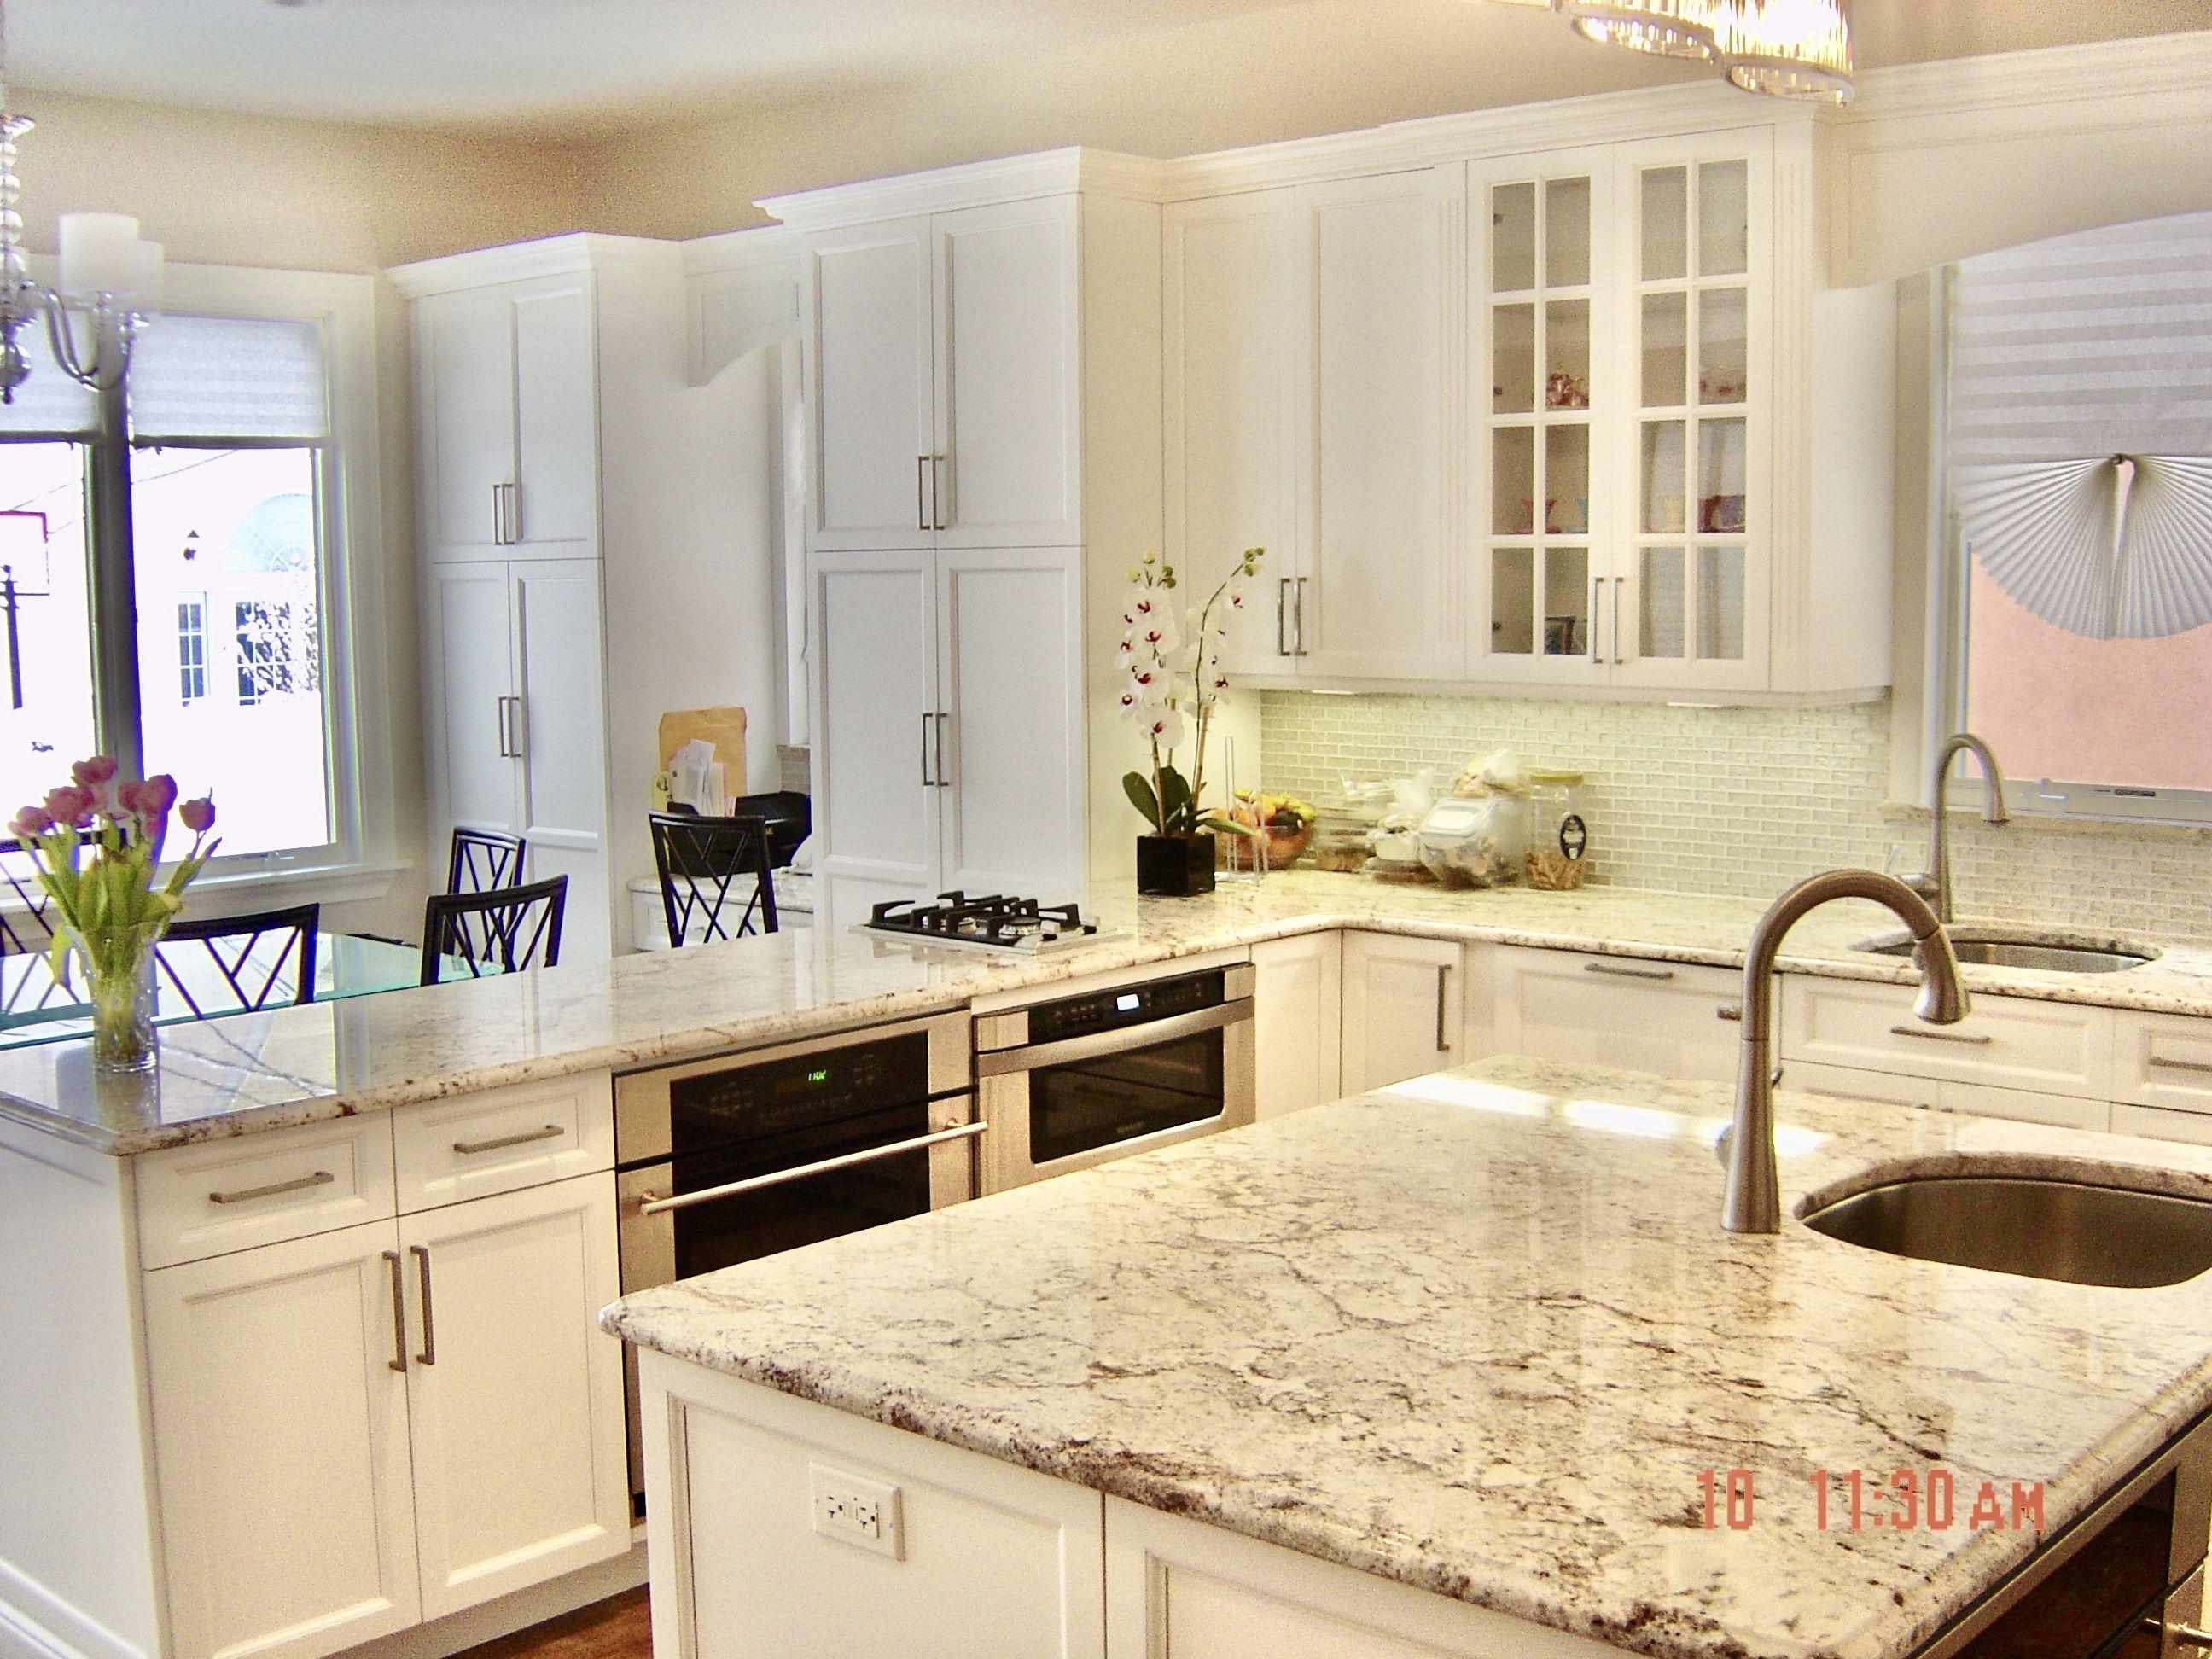 White Shaker Kitchen In 2020 White Shaker Kitchen Shaker Kitchen Kitchen Cabinets Nyc